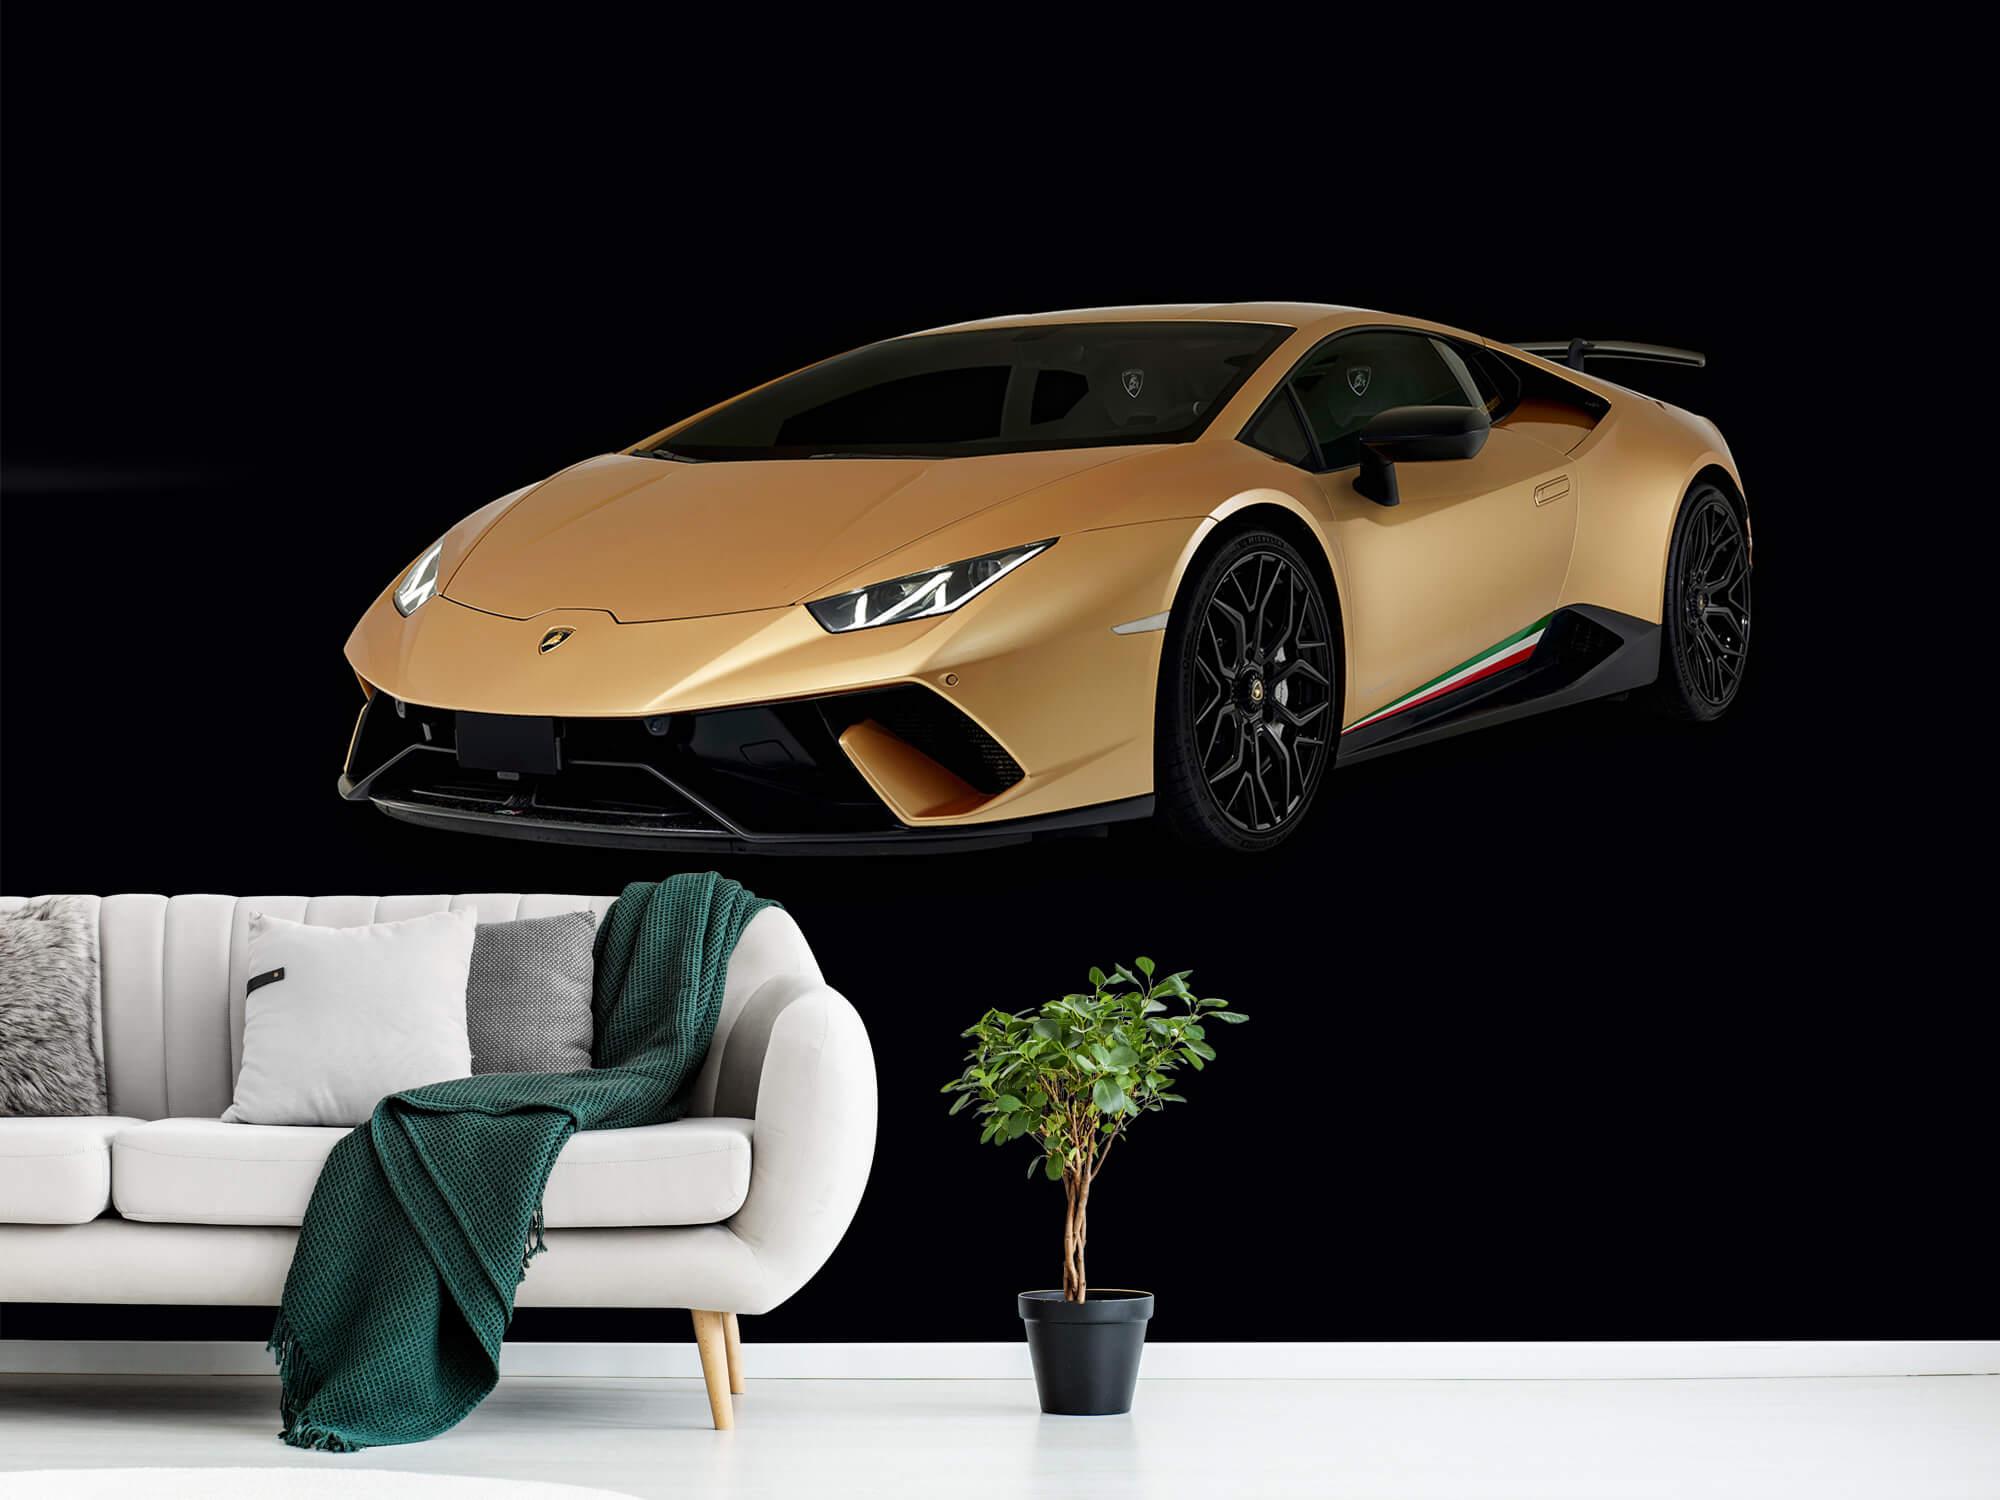 Wallpaper Lamborghini Huracán - Avant droit, noir 1